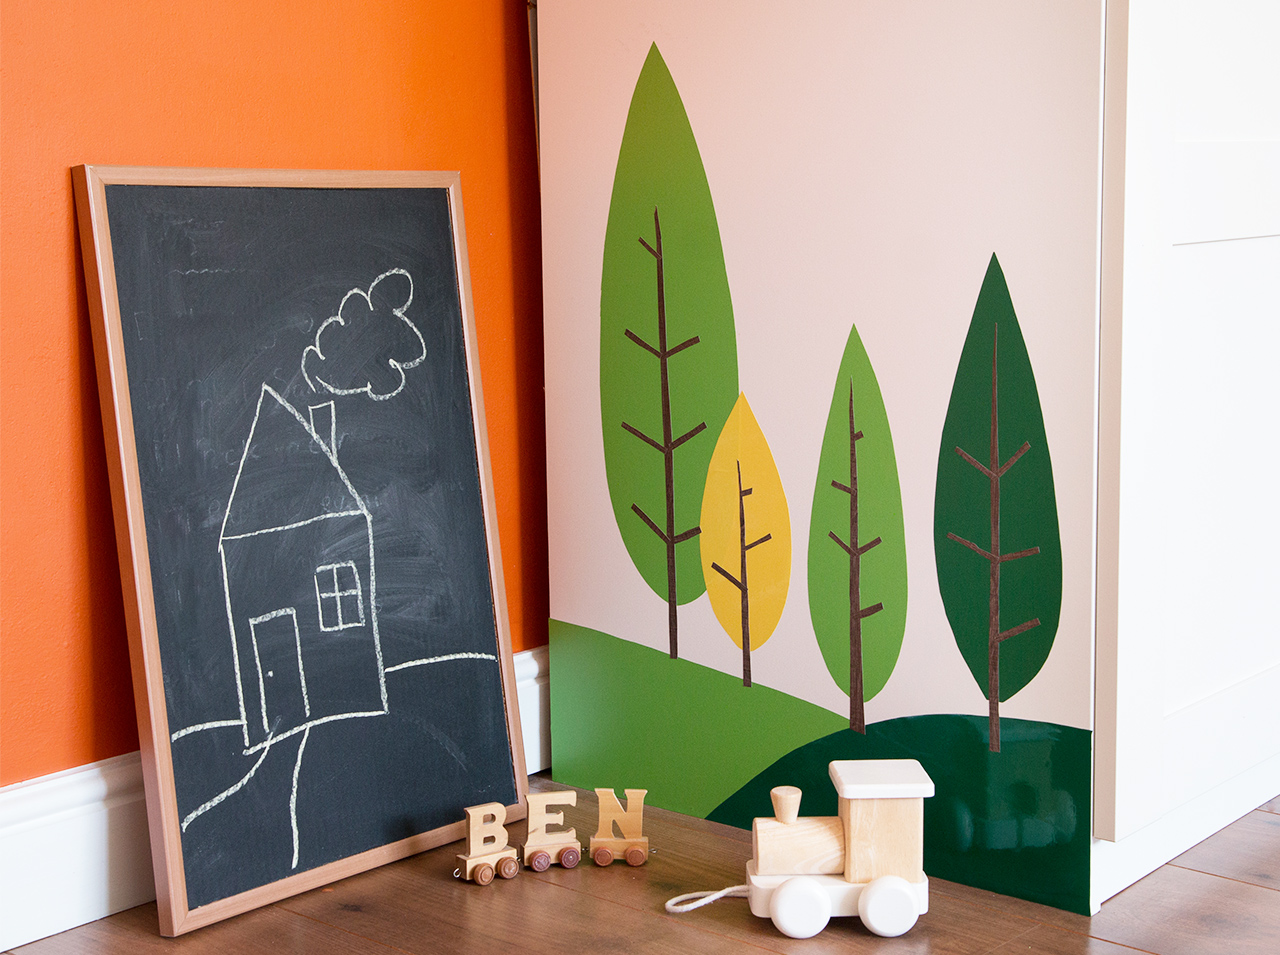 dcfix Möbel Klebefolie Dekofolie DIY Deko Kinderzimmer Bäume